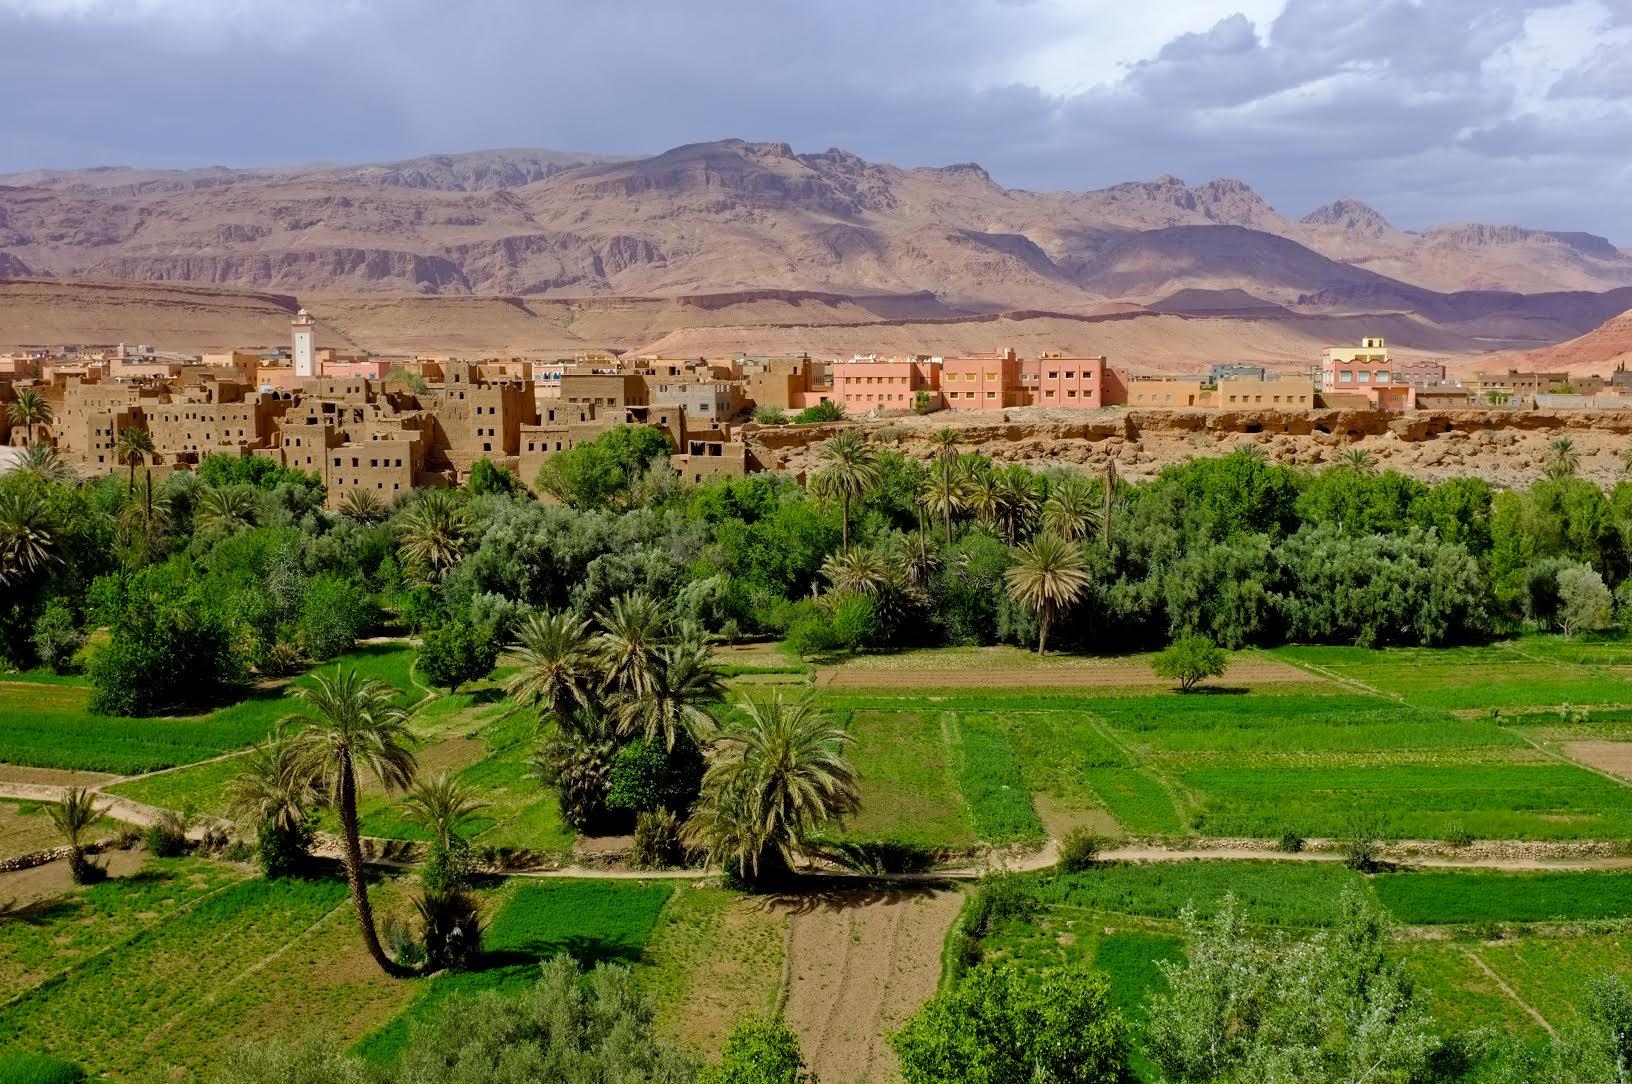 Plaquette Maroc 2012